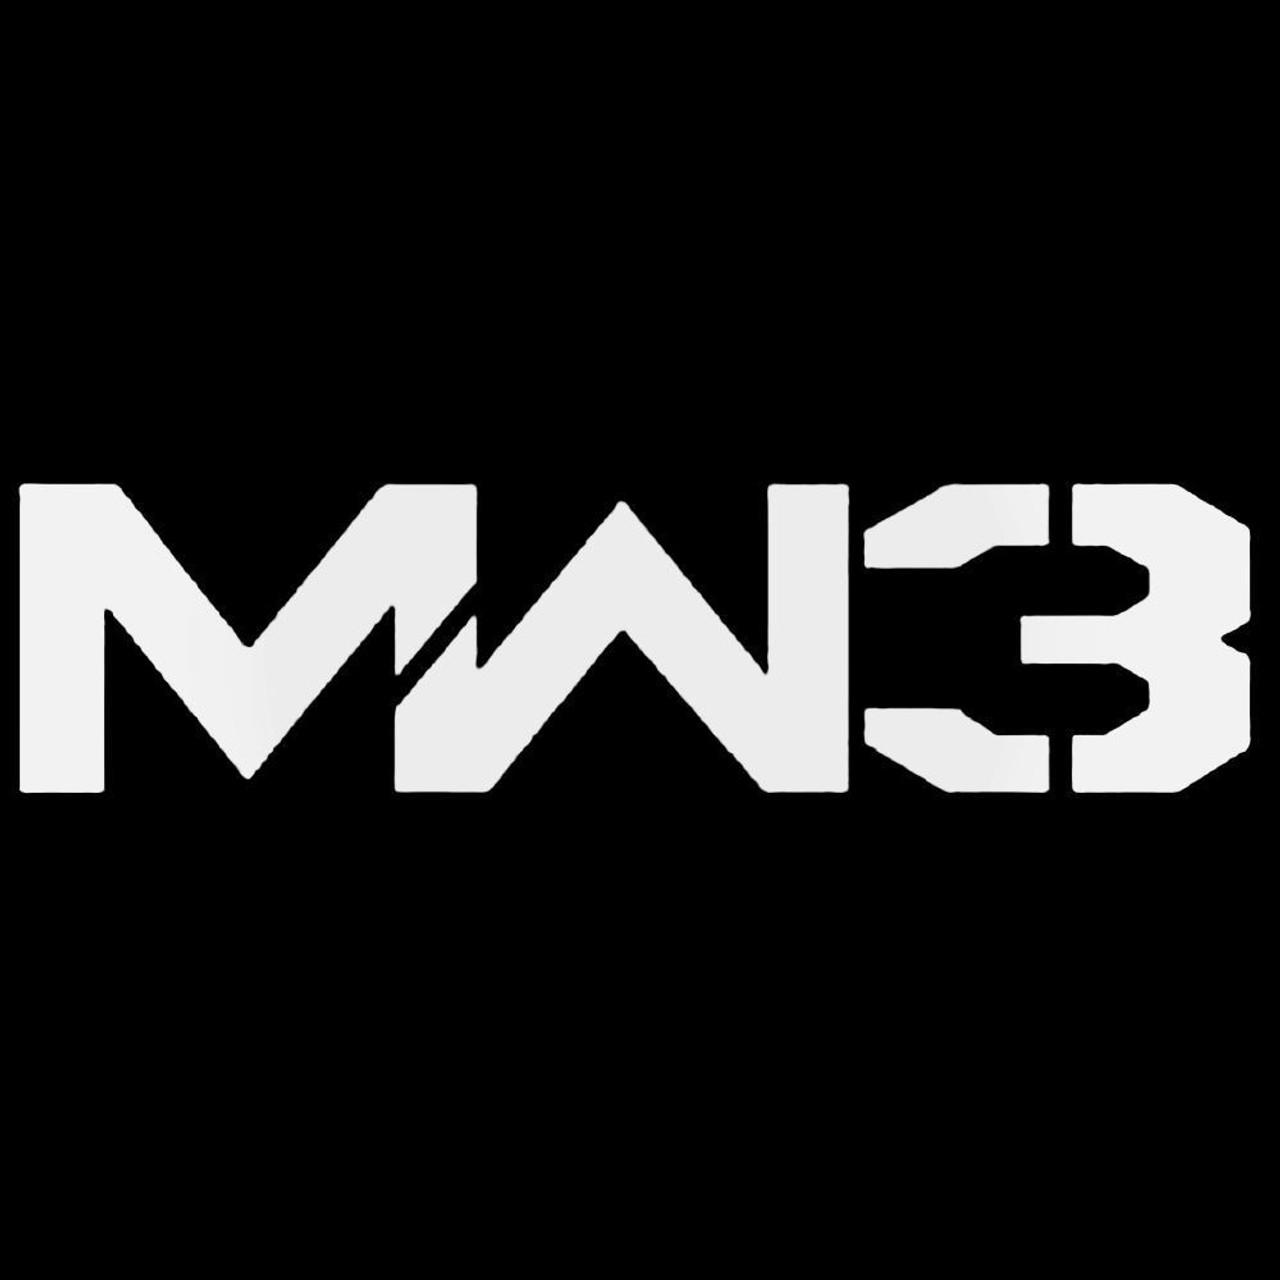 Call Of Duty Modern Warfare 3 Logo Decal Sticker